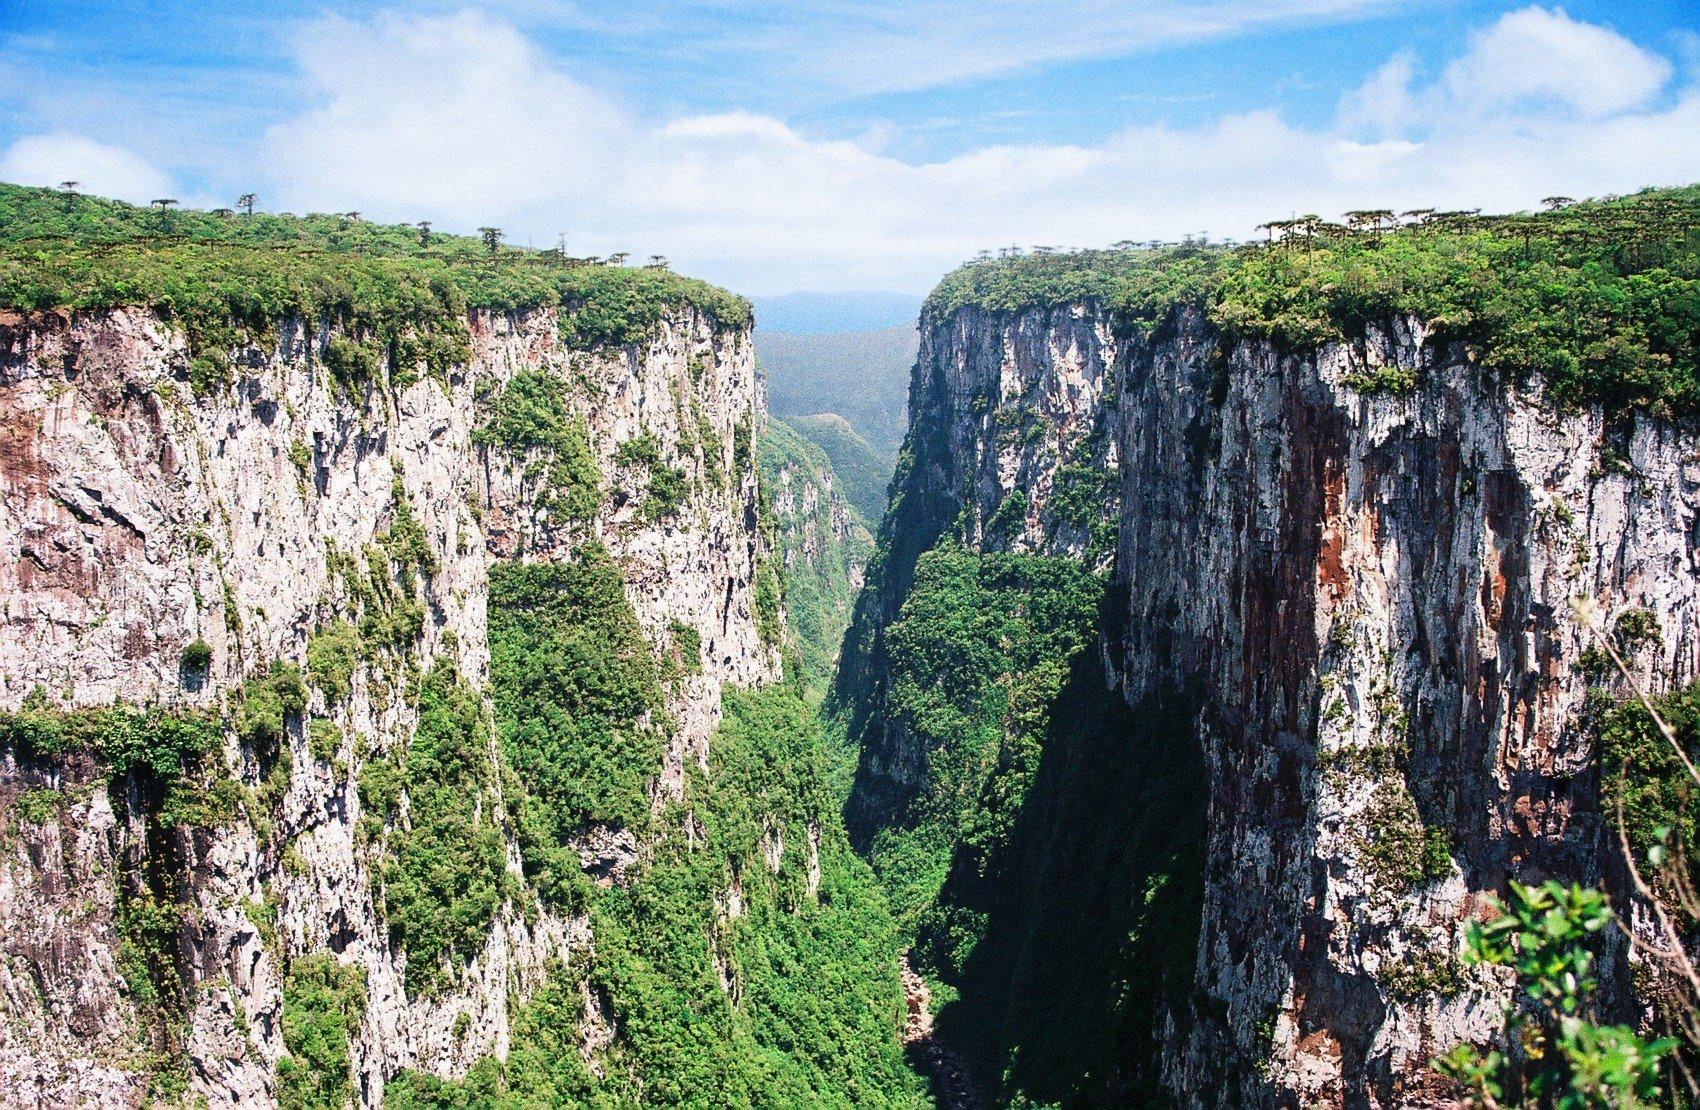 File:Itaimbézinho Canyon 2006.jpg